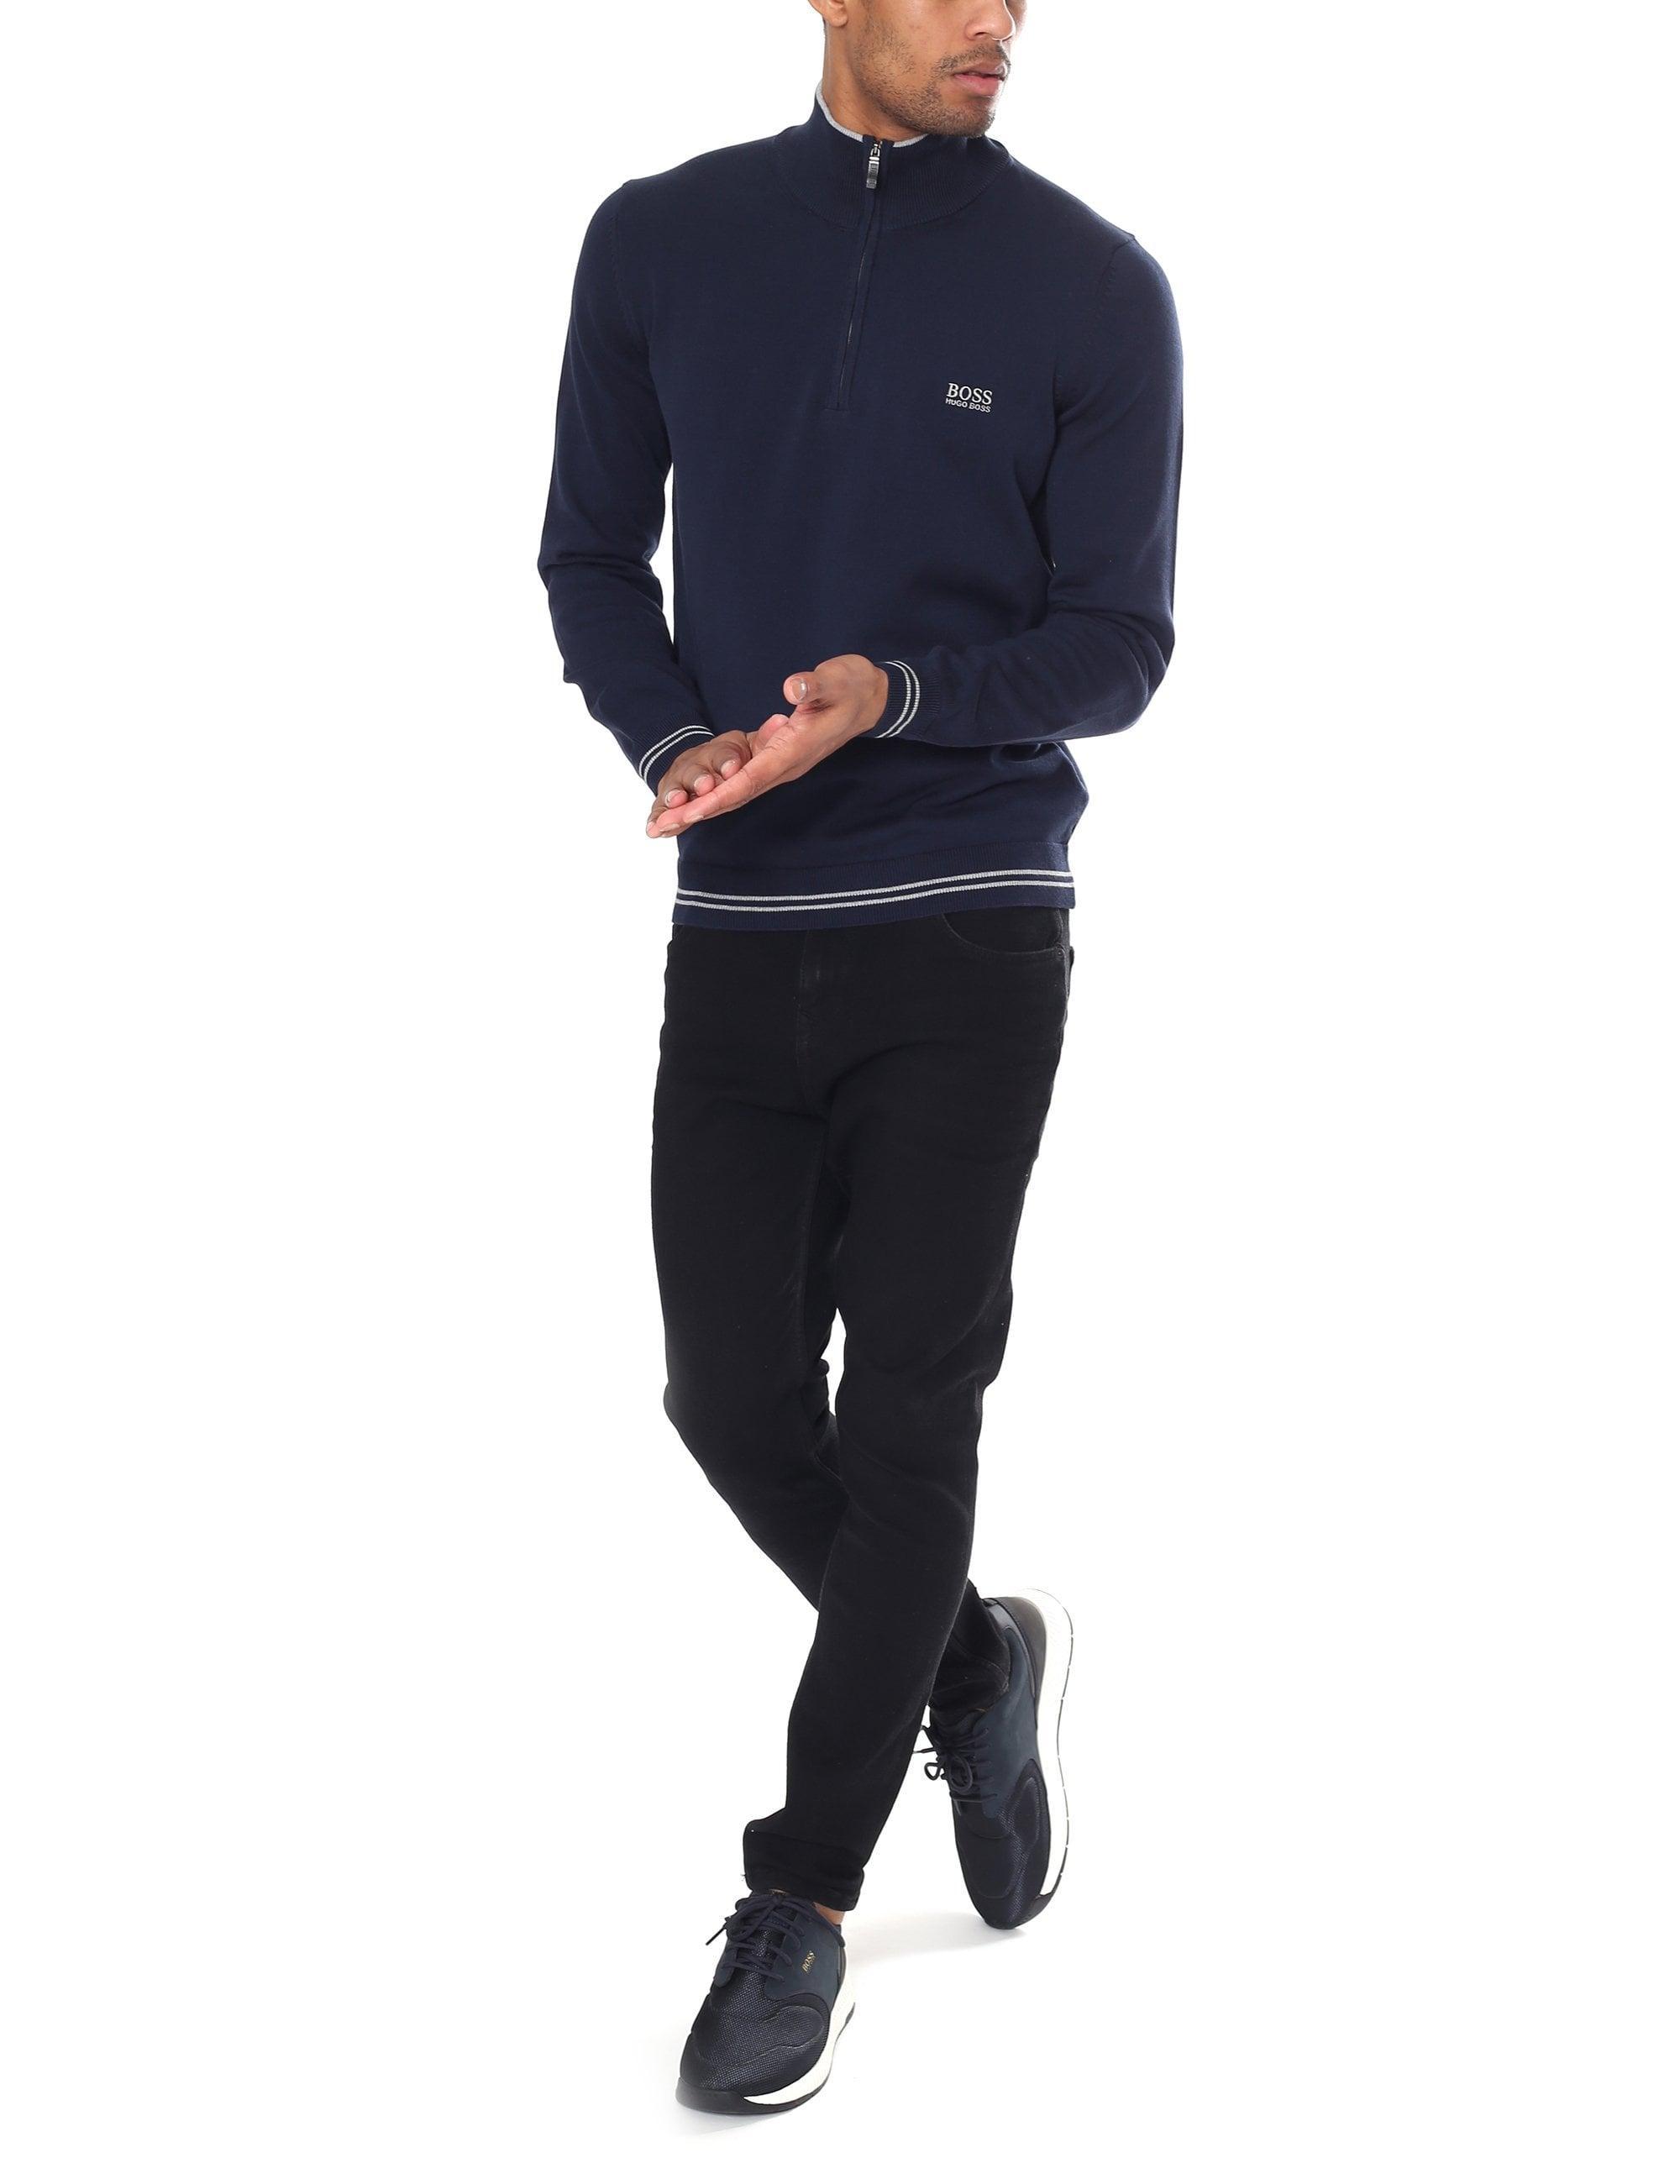 bc2e94ba9 BOSS Athleisure Zimex Quarter Zip Pullover Knit in Blue for Men - Lyst